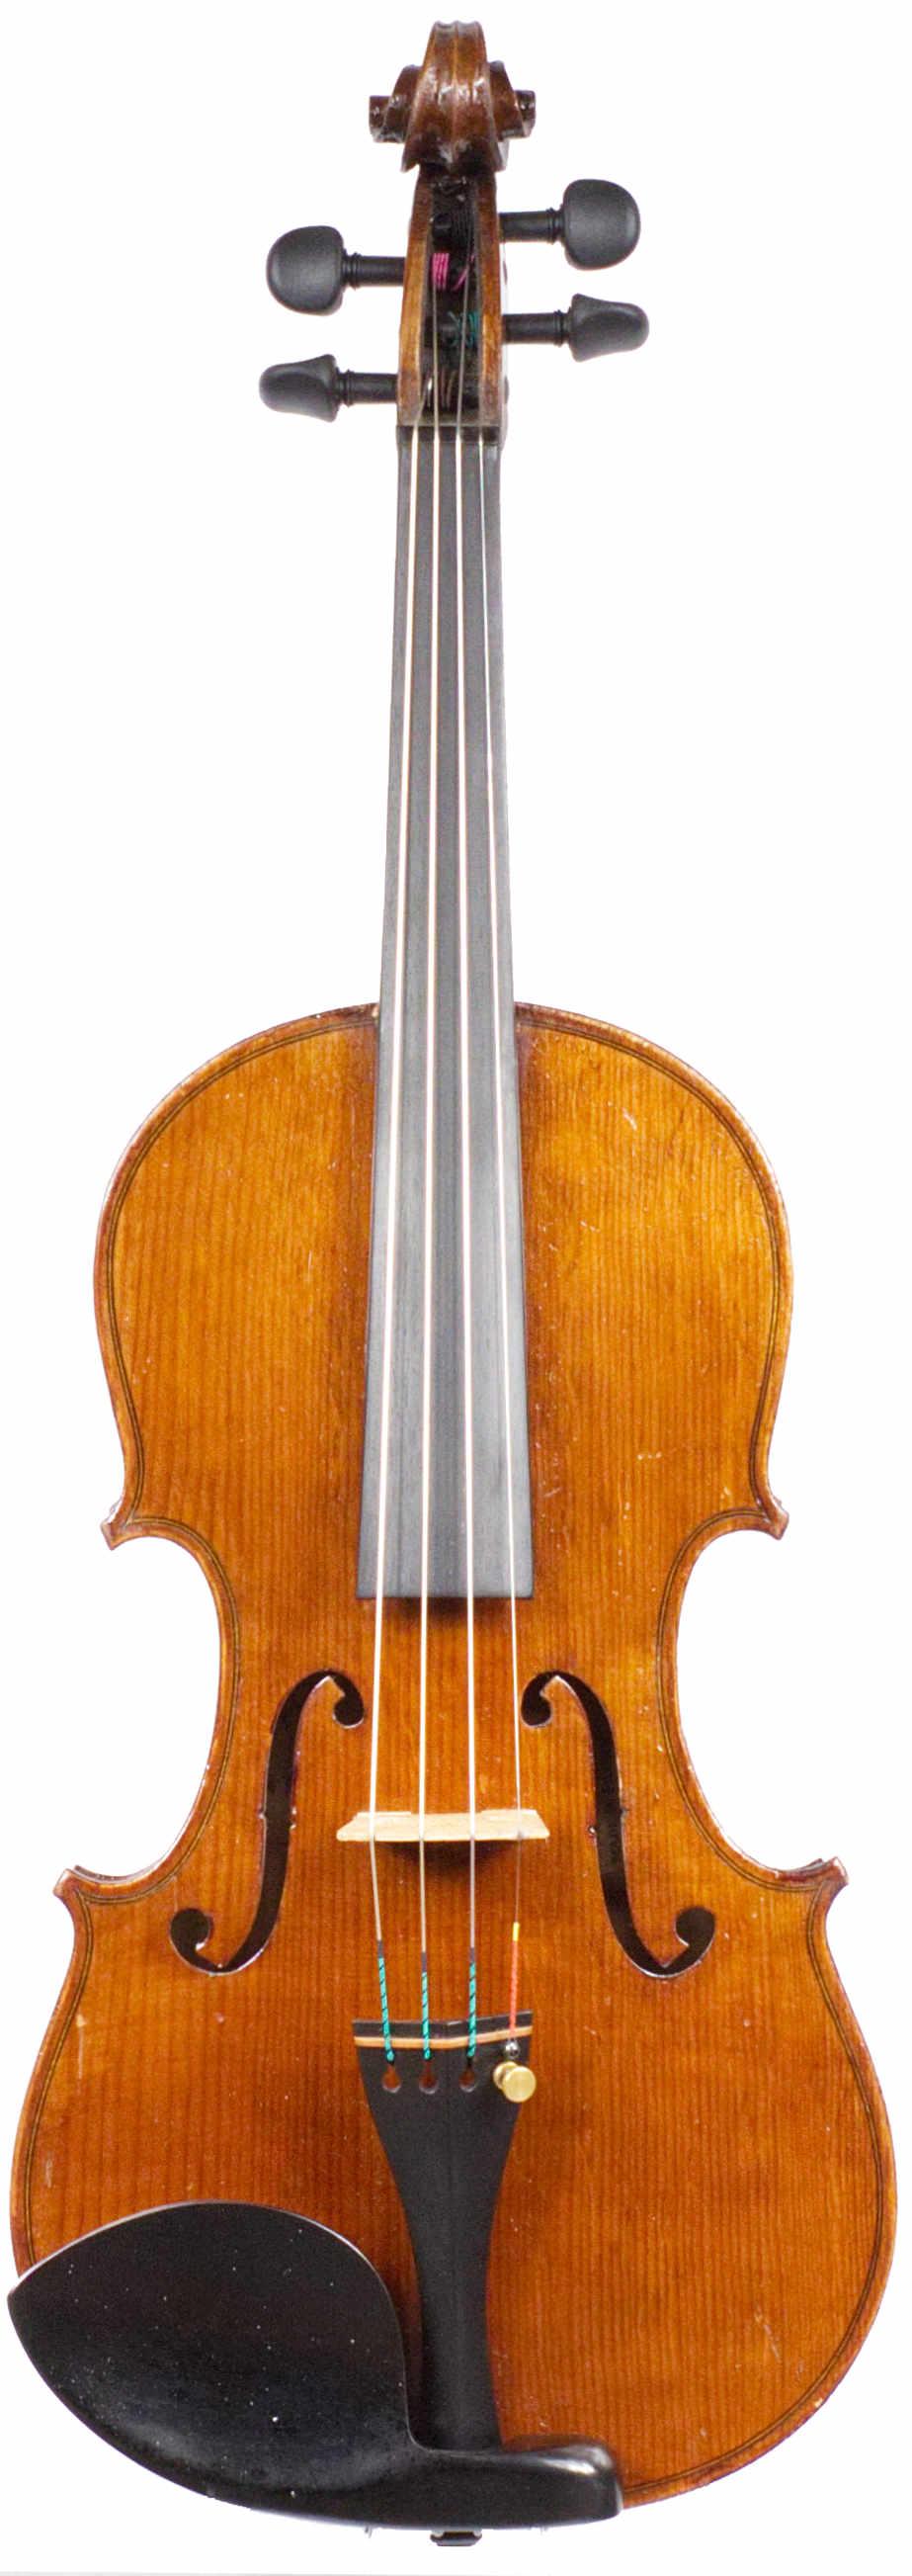 French JTL violin